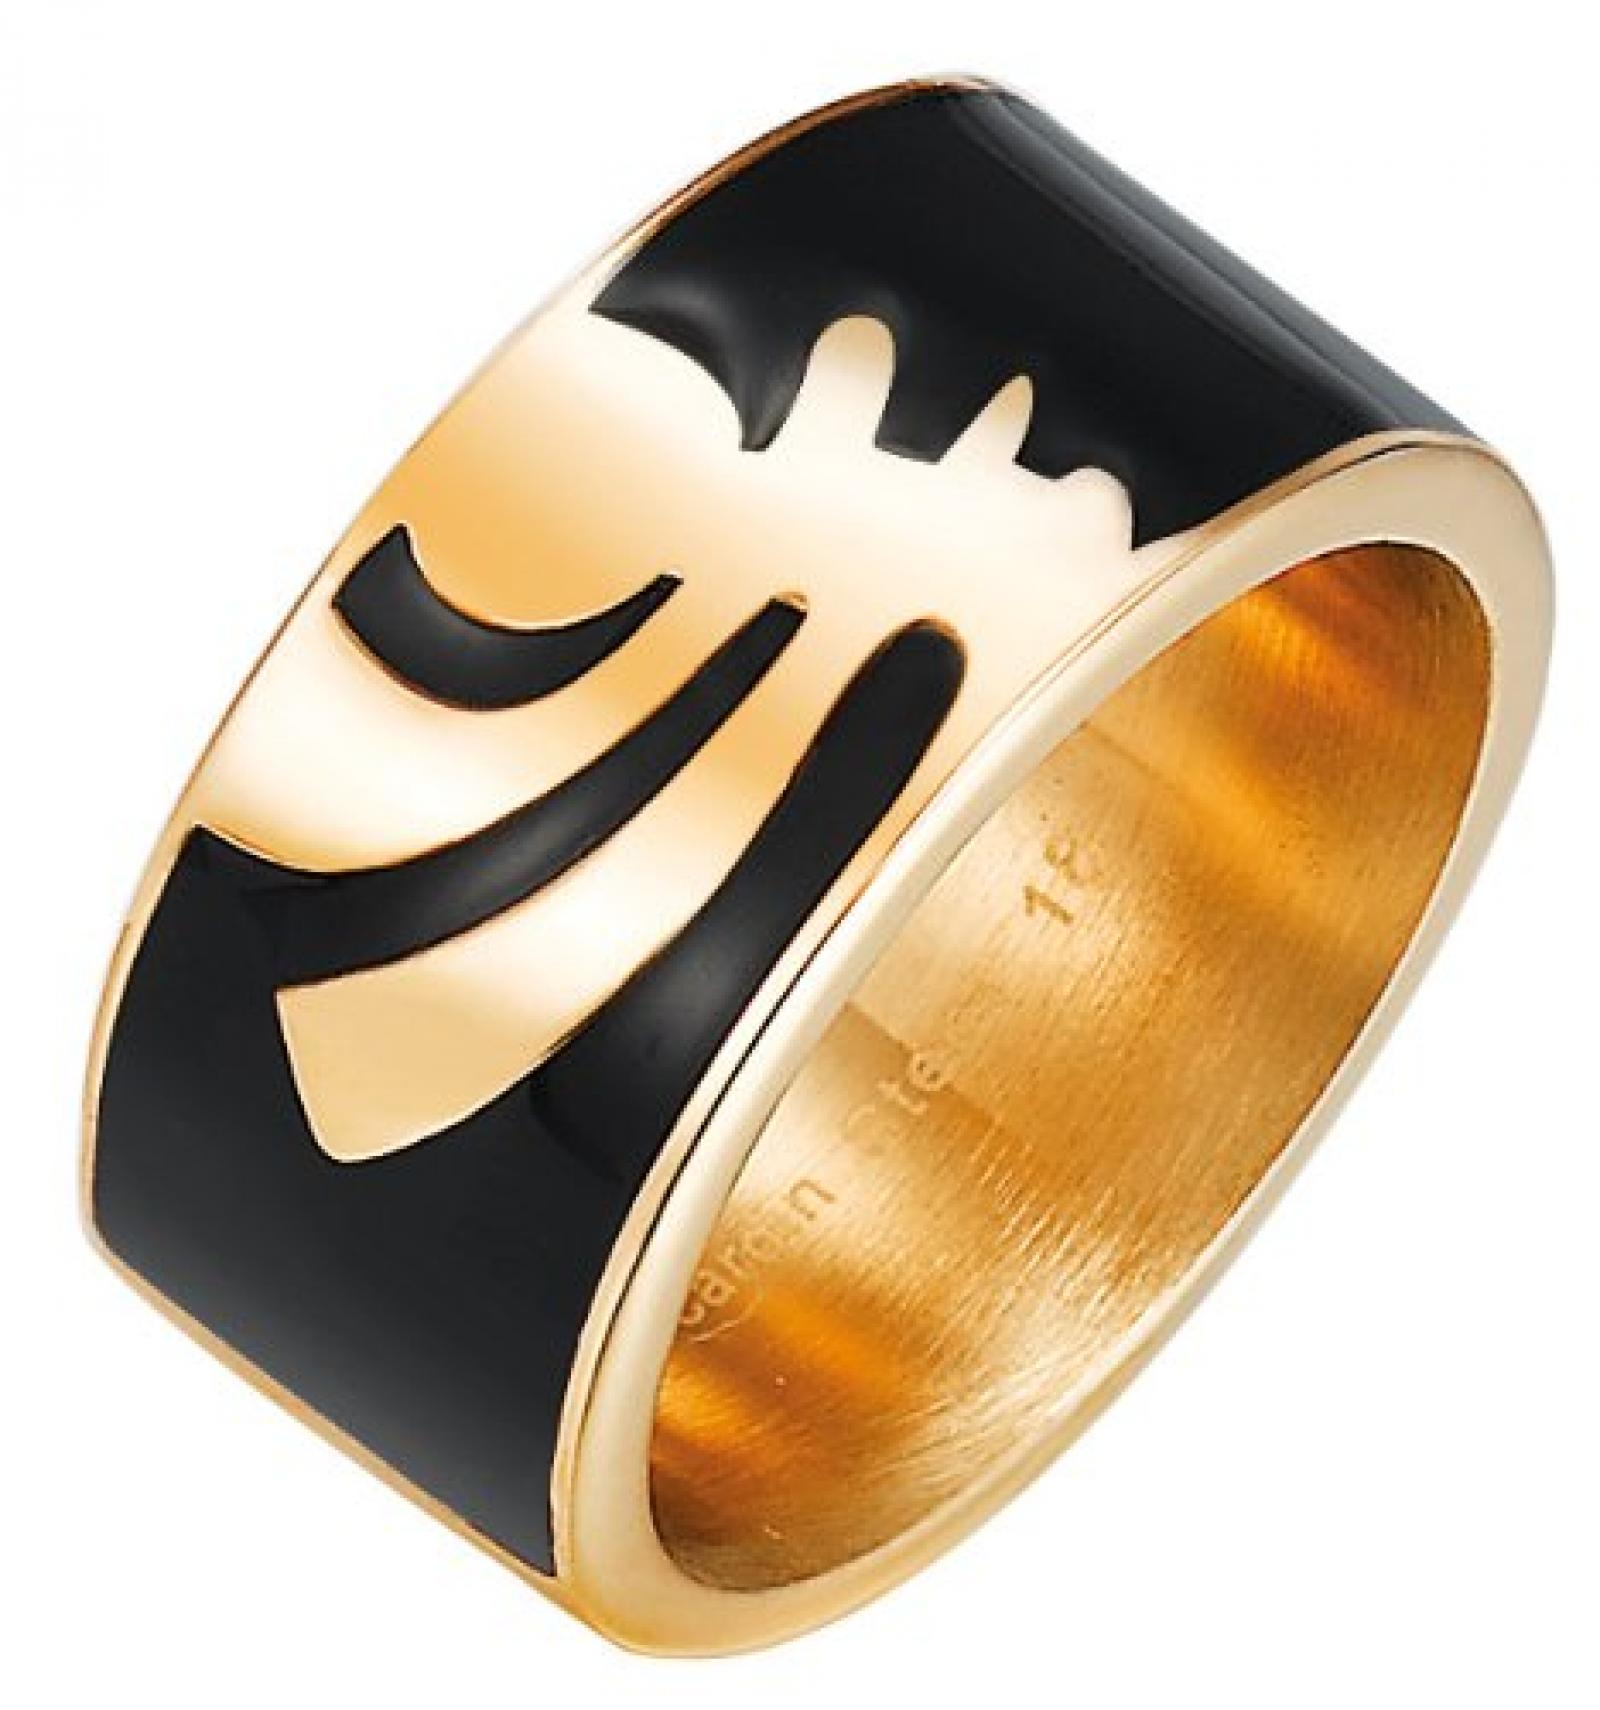 Pierre Cardin Unisex-Ring 925 Sterling Silber Edelstahl rhodiniert Kunststoff Totem  PCRG10008C